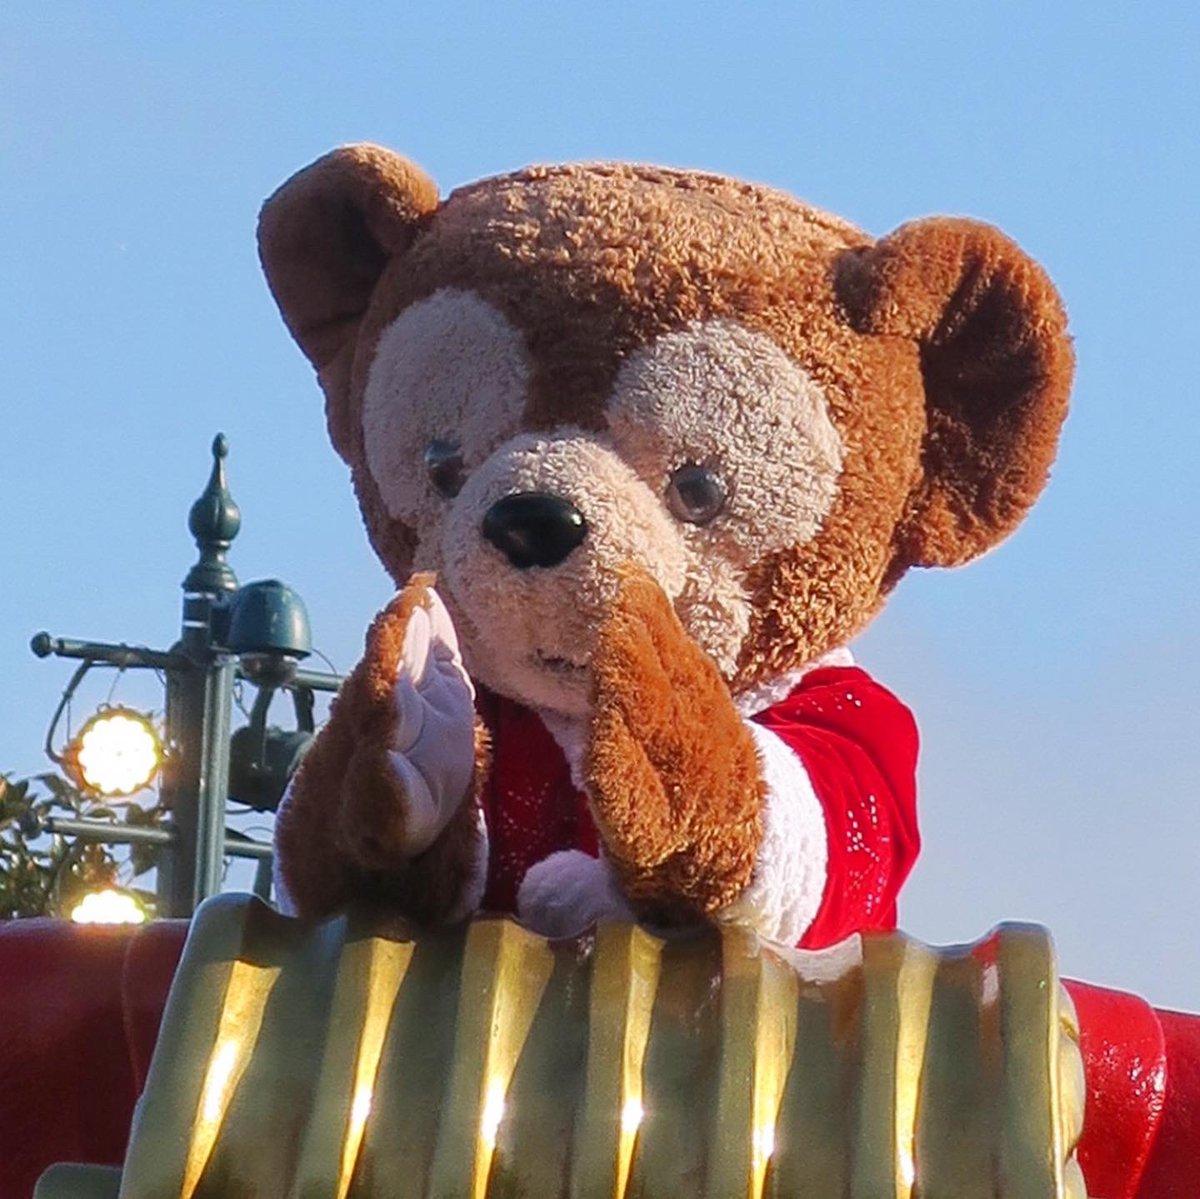 🎄🐻♥️ • Disney's Christmas Parade ! 🎅🏻 💫 🎄   #disneylandparis #disneyparks #disneyXmas #MerryXmas #duffythedisneybear